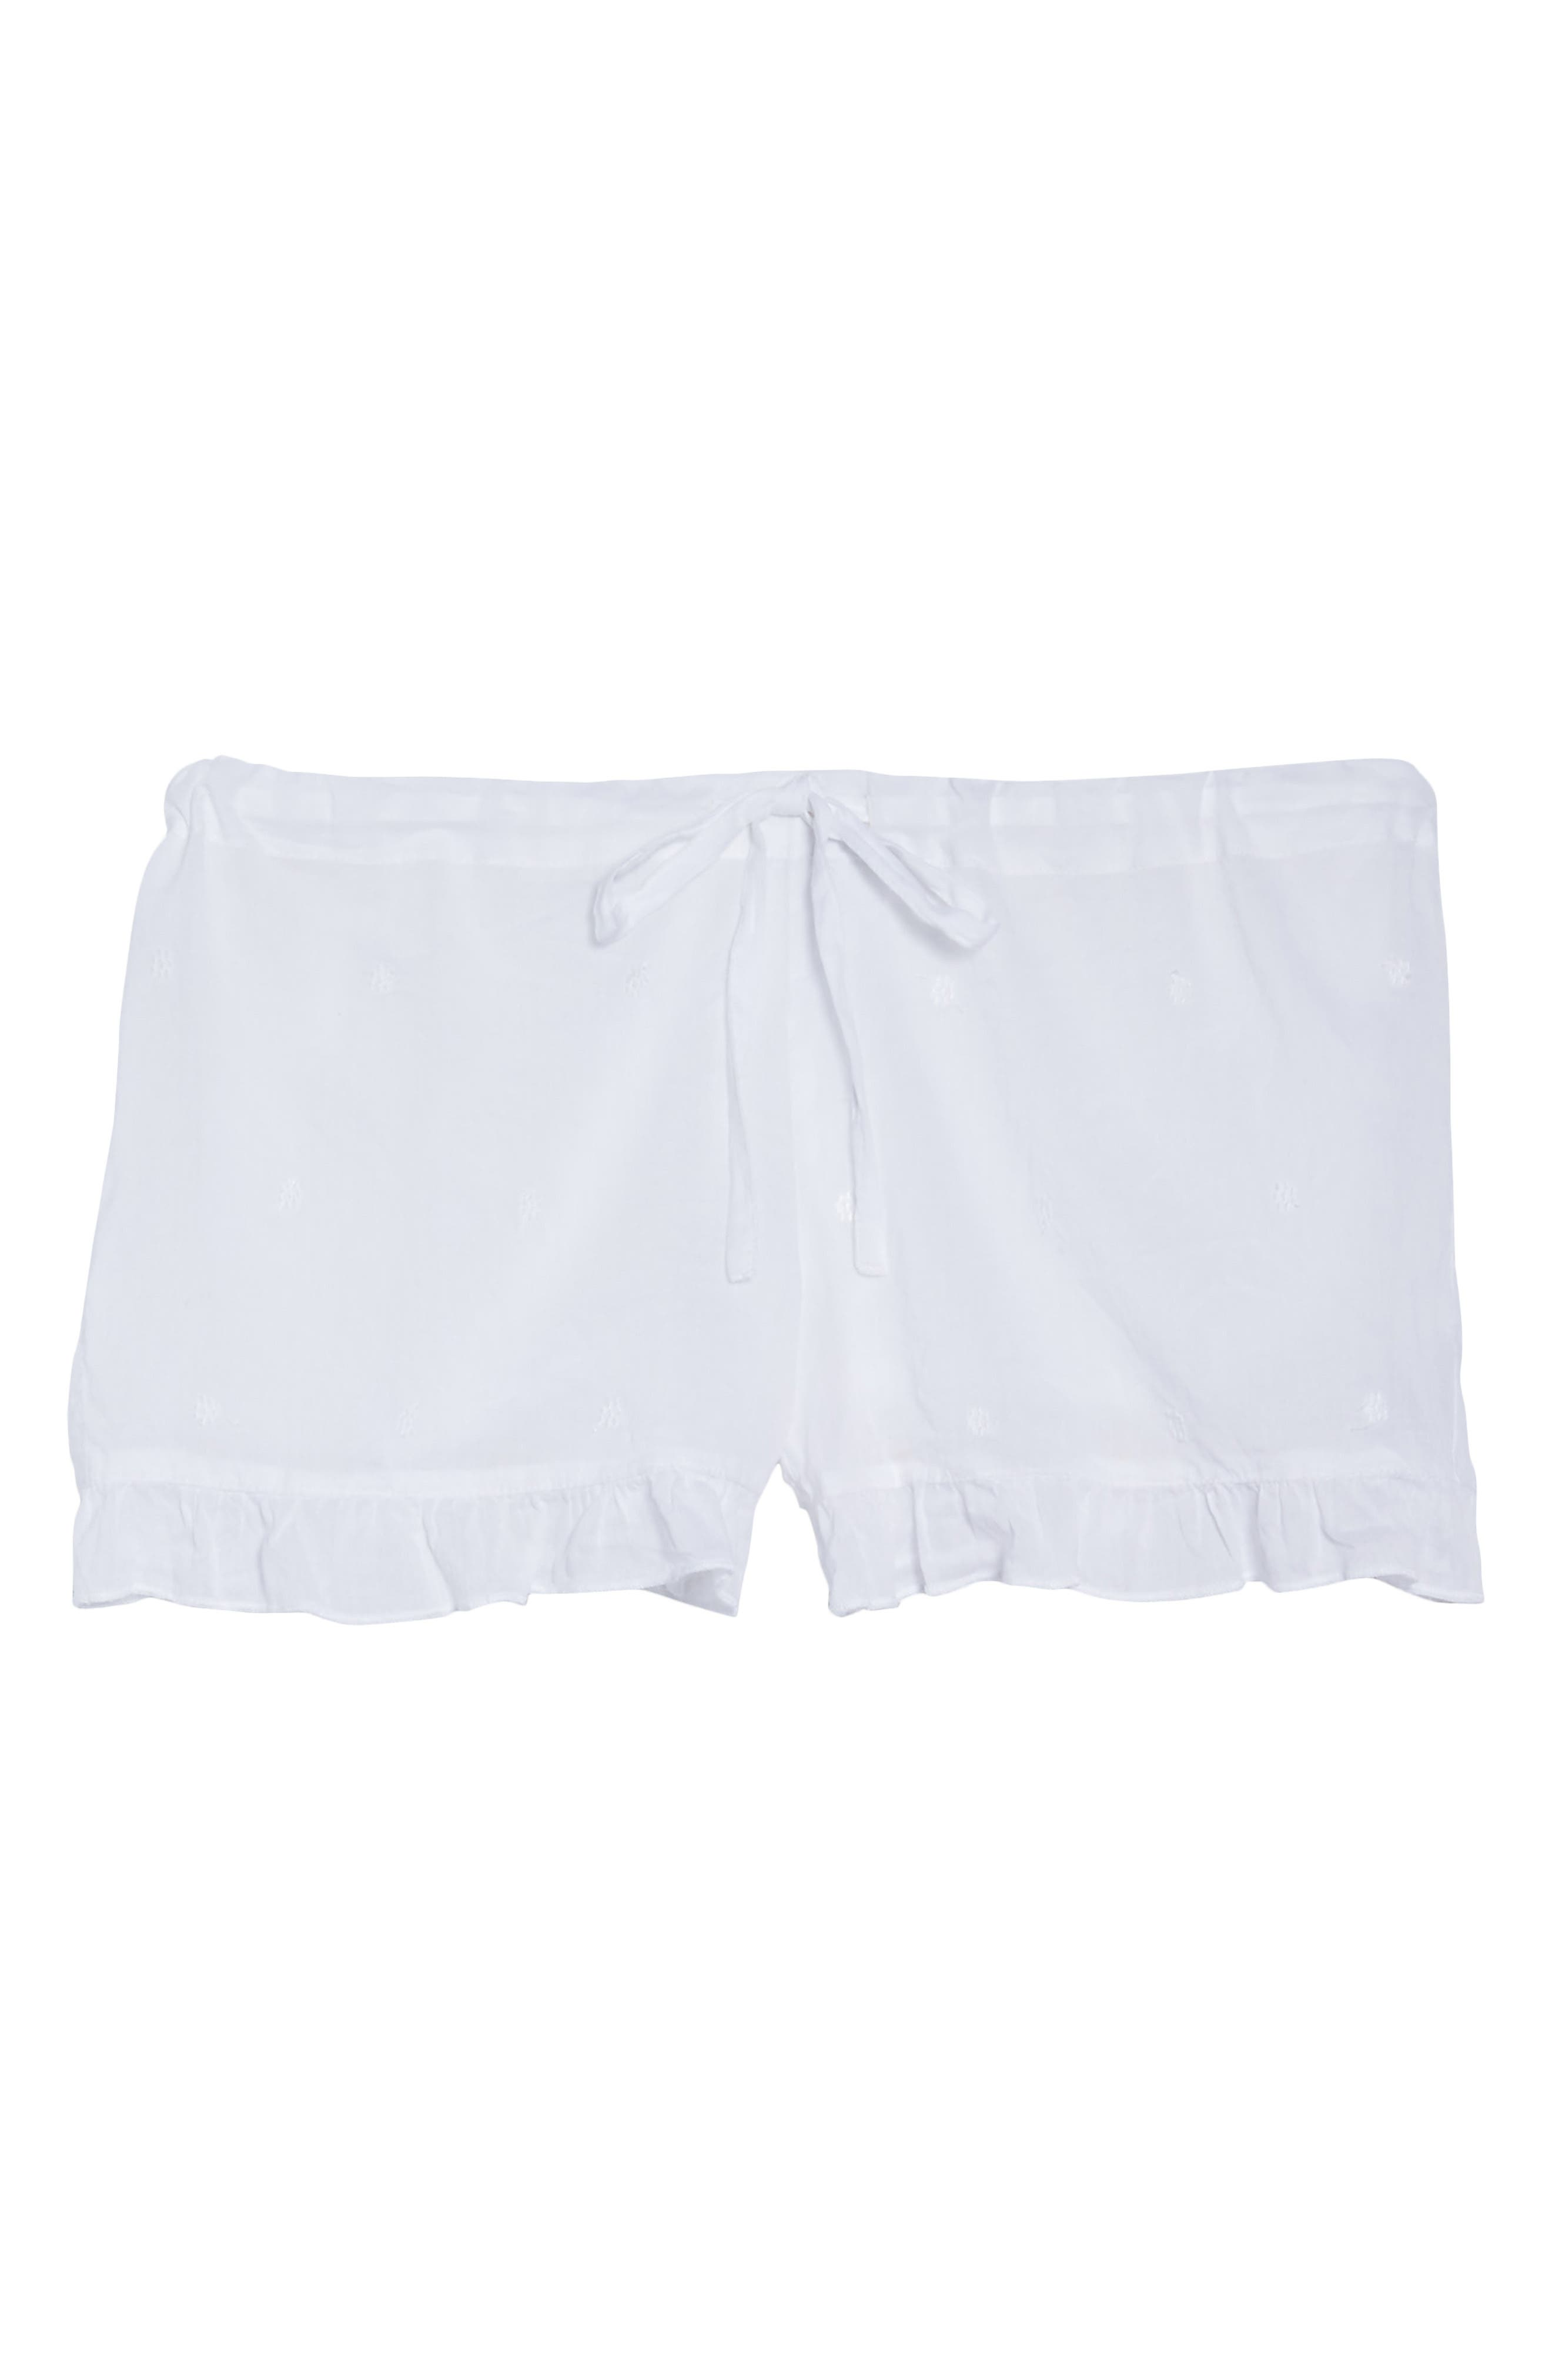 Ruffle Sleep Shorts,                             Alternate thumbnail 6, color,                             White